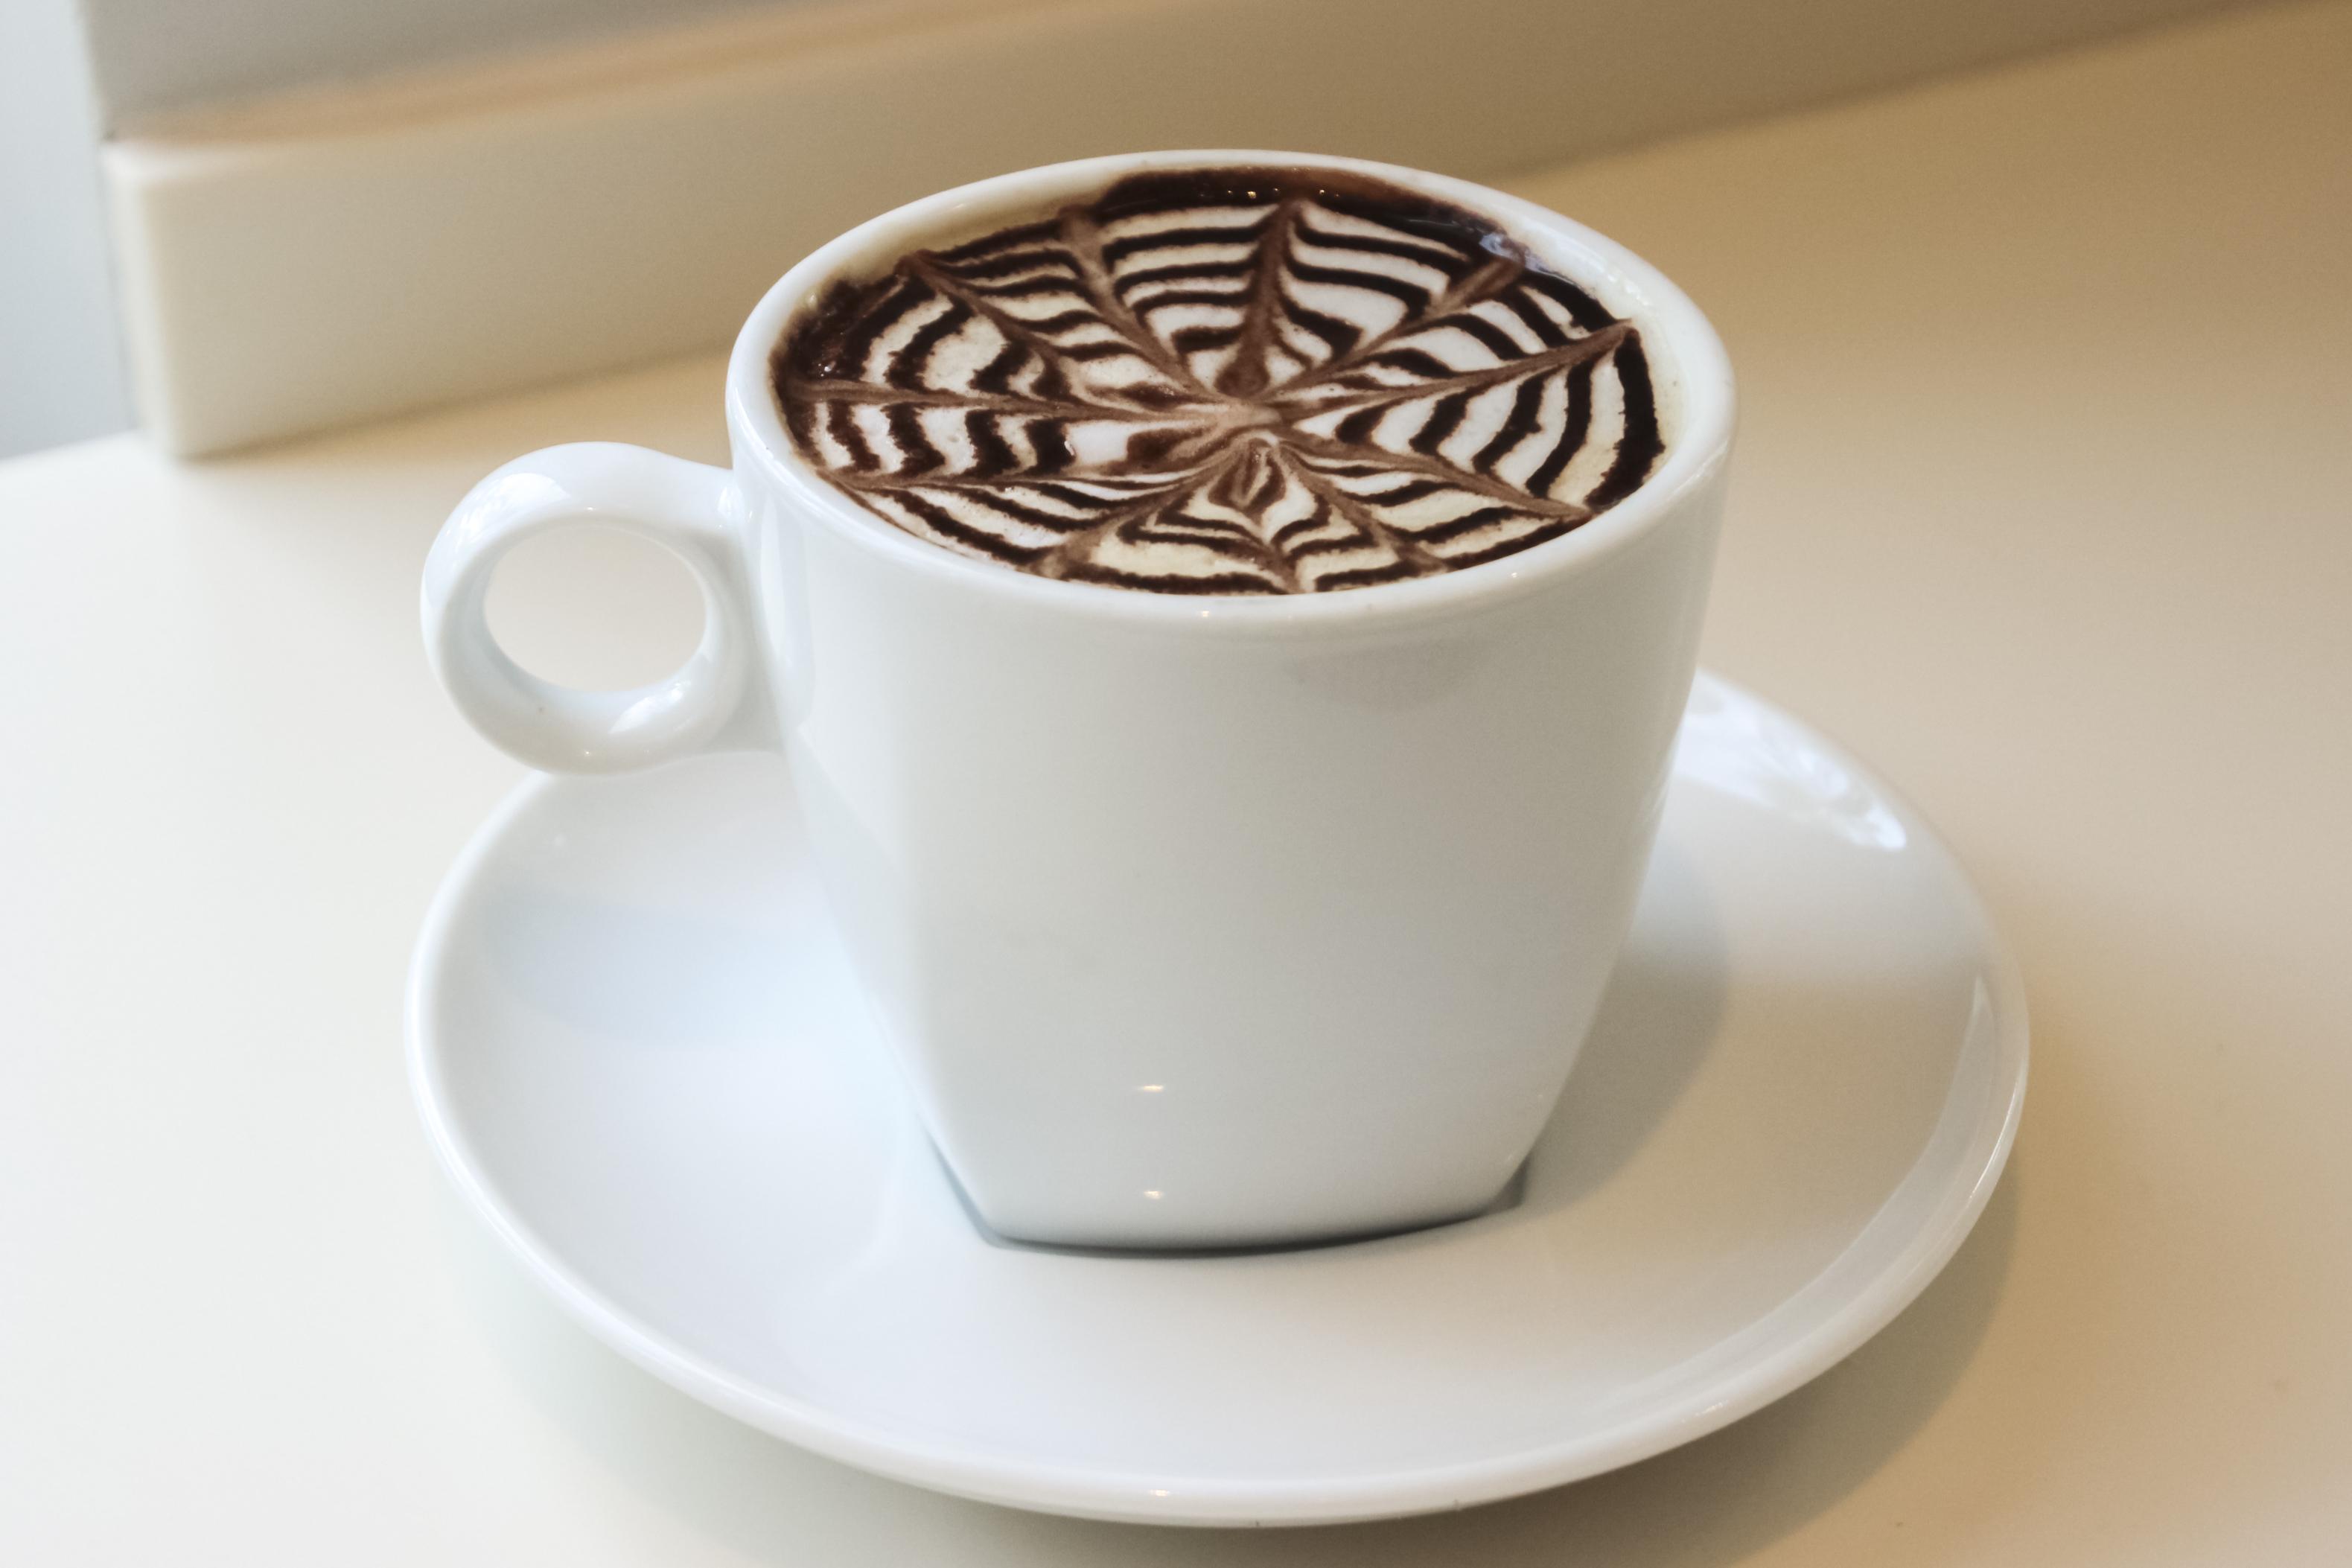 Latte with Mocha